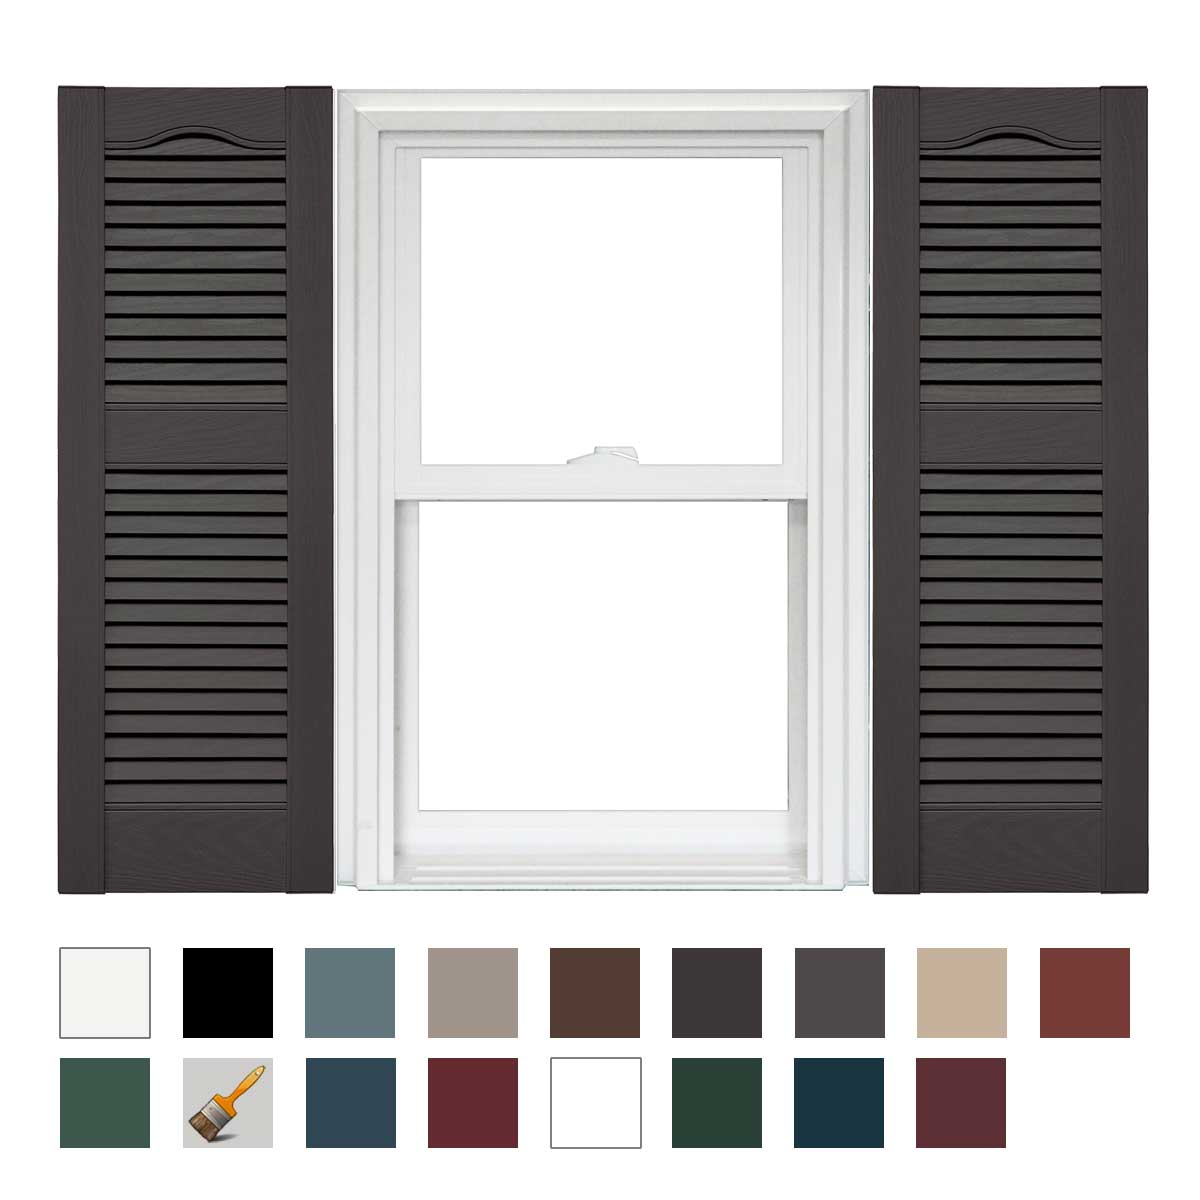 12 x 25 018 Tuxedo Gray